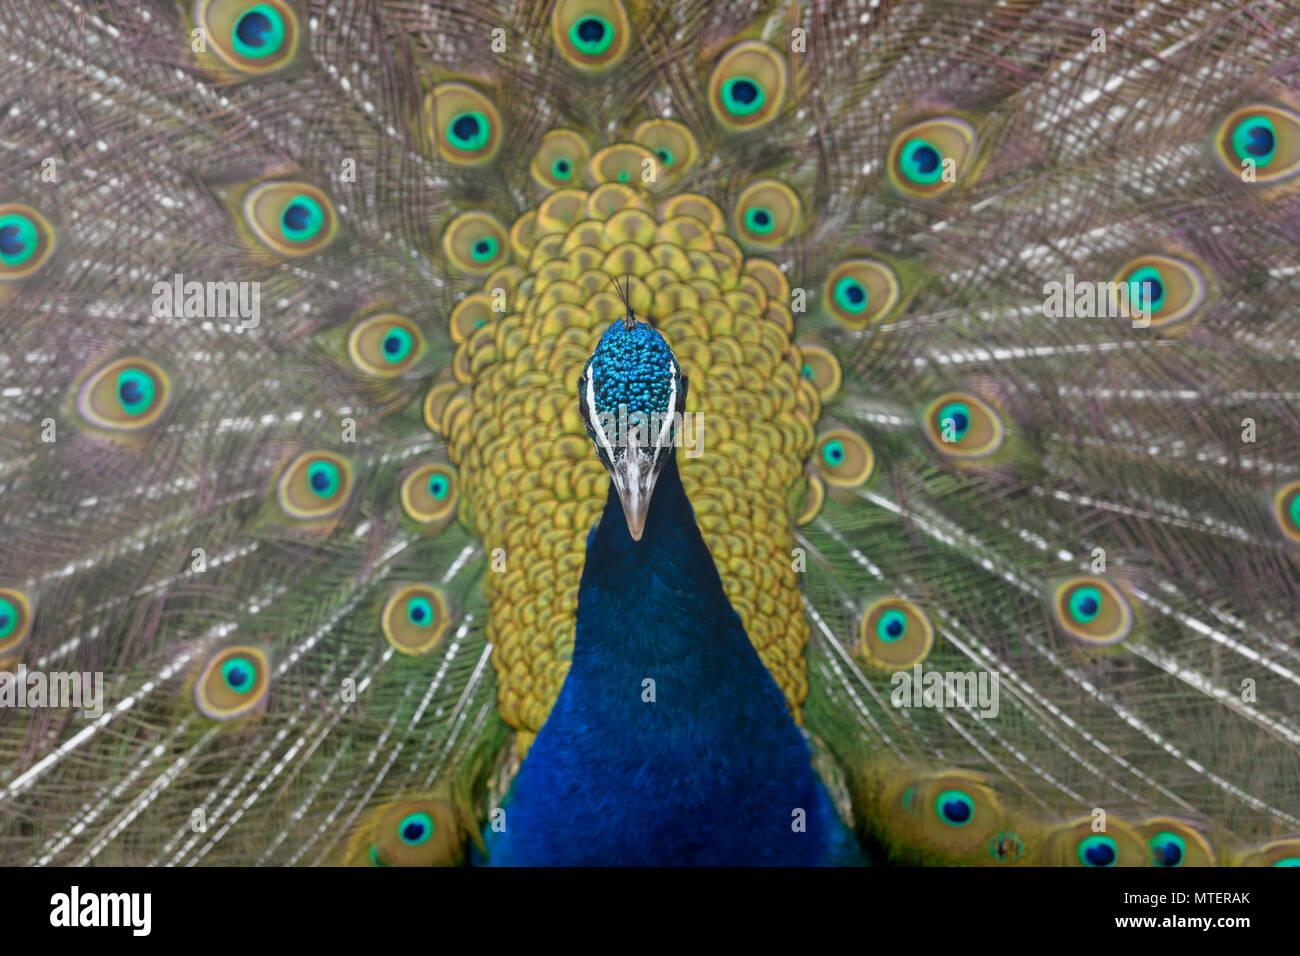 Beautiful Peacock bird - Stock Image